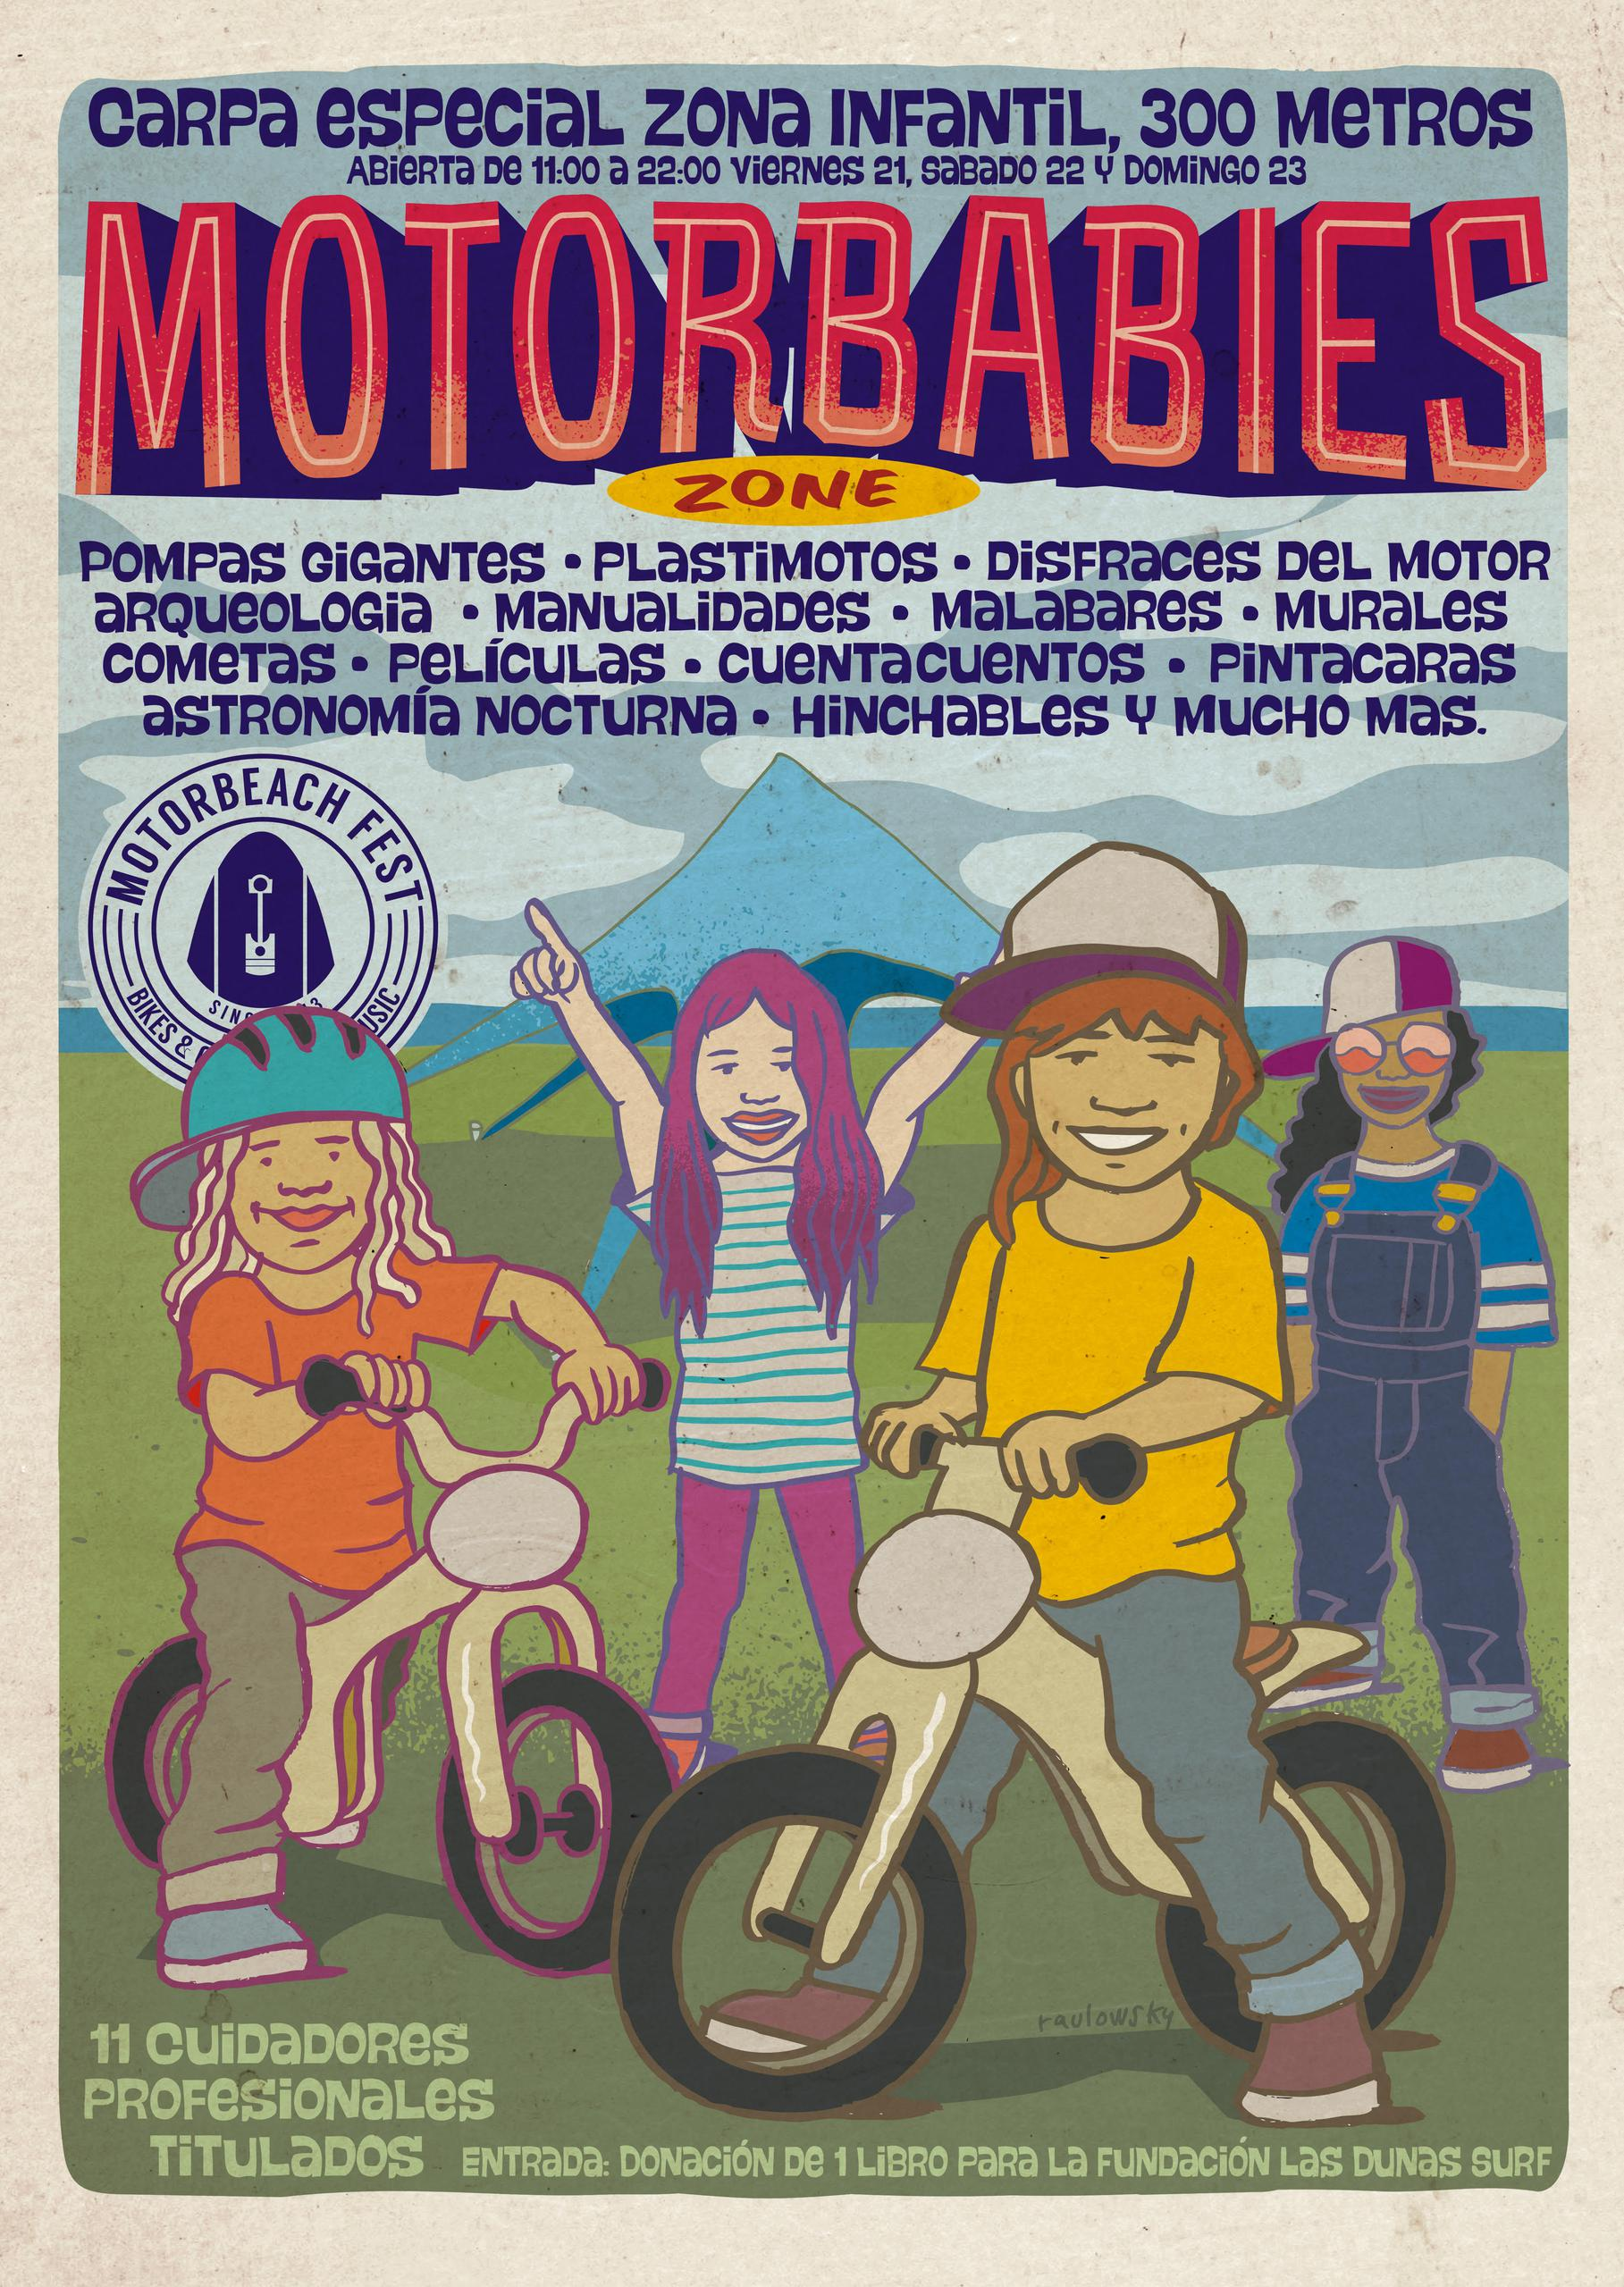 Motorbabies Zone